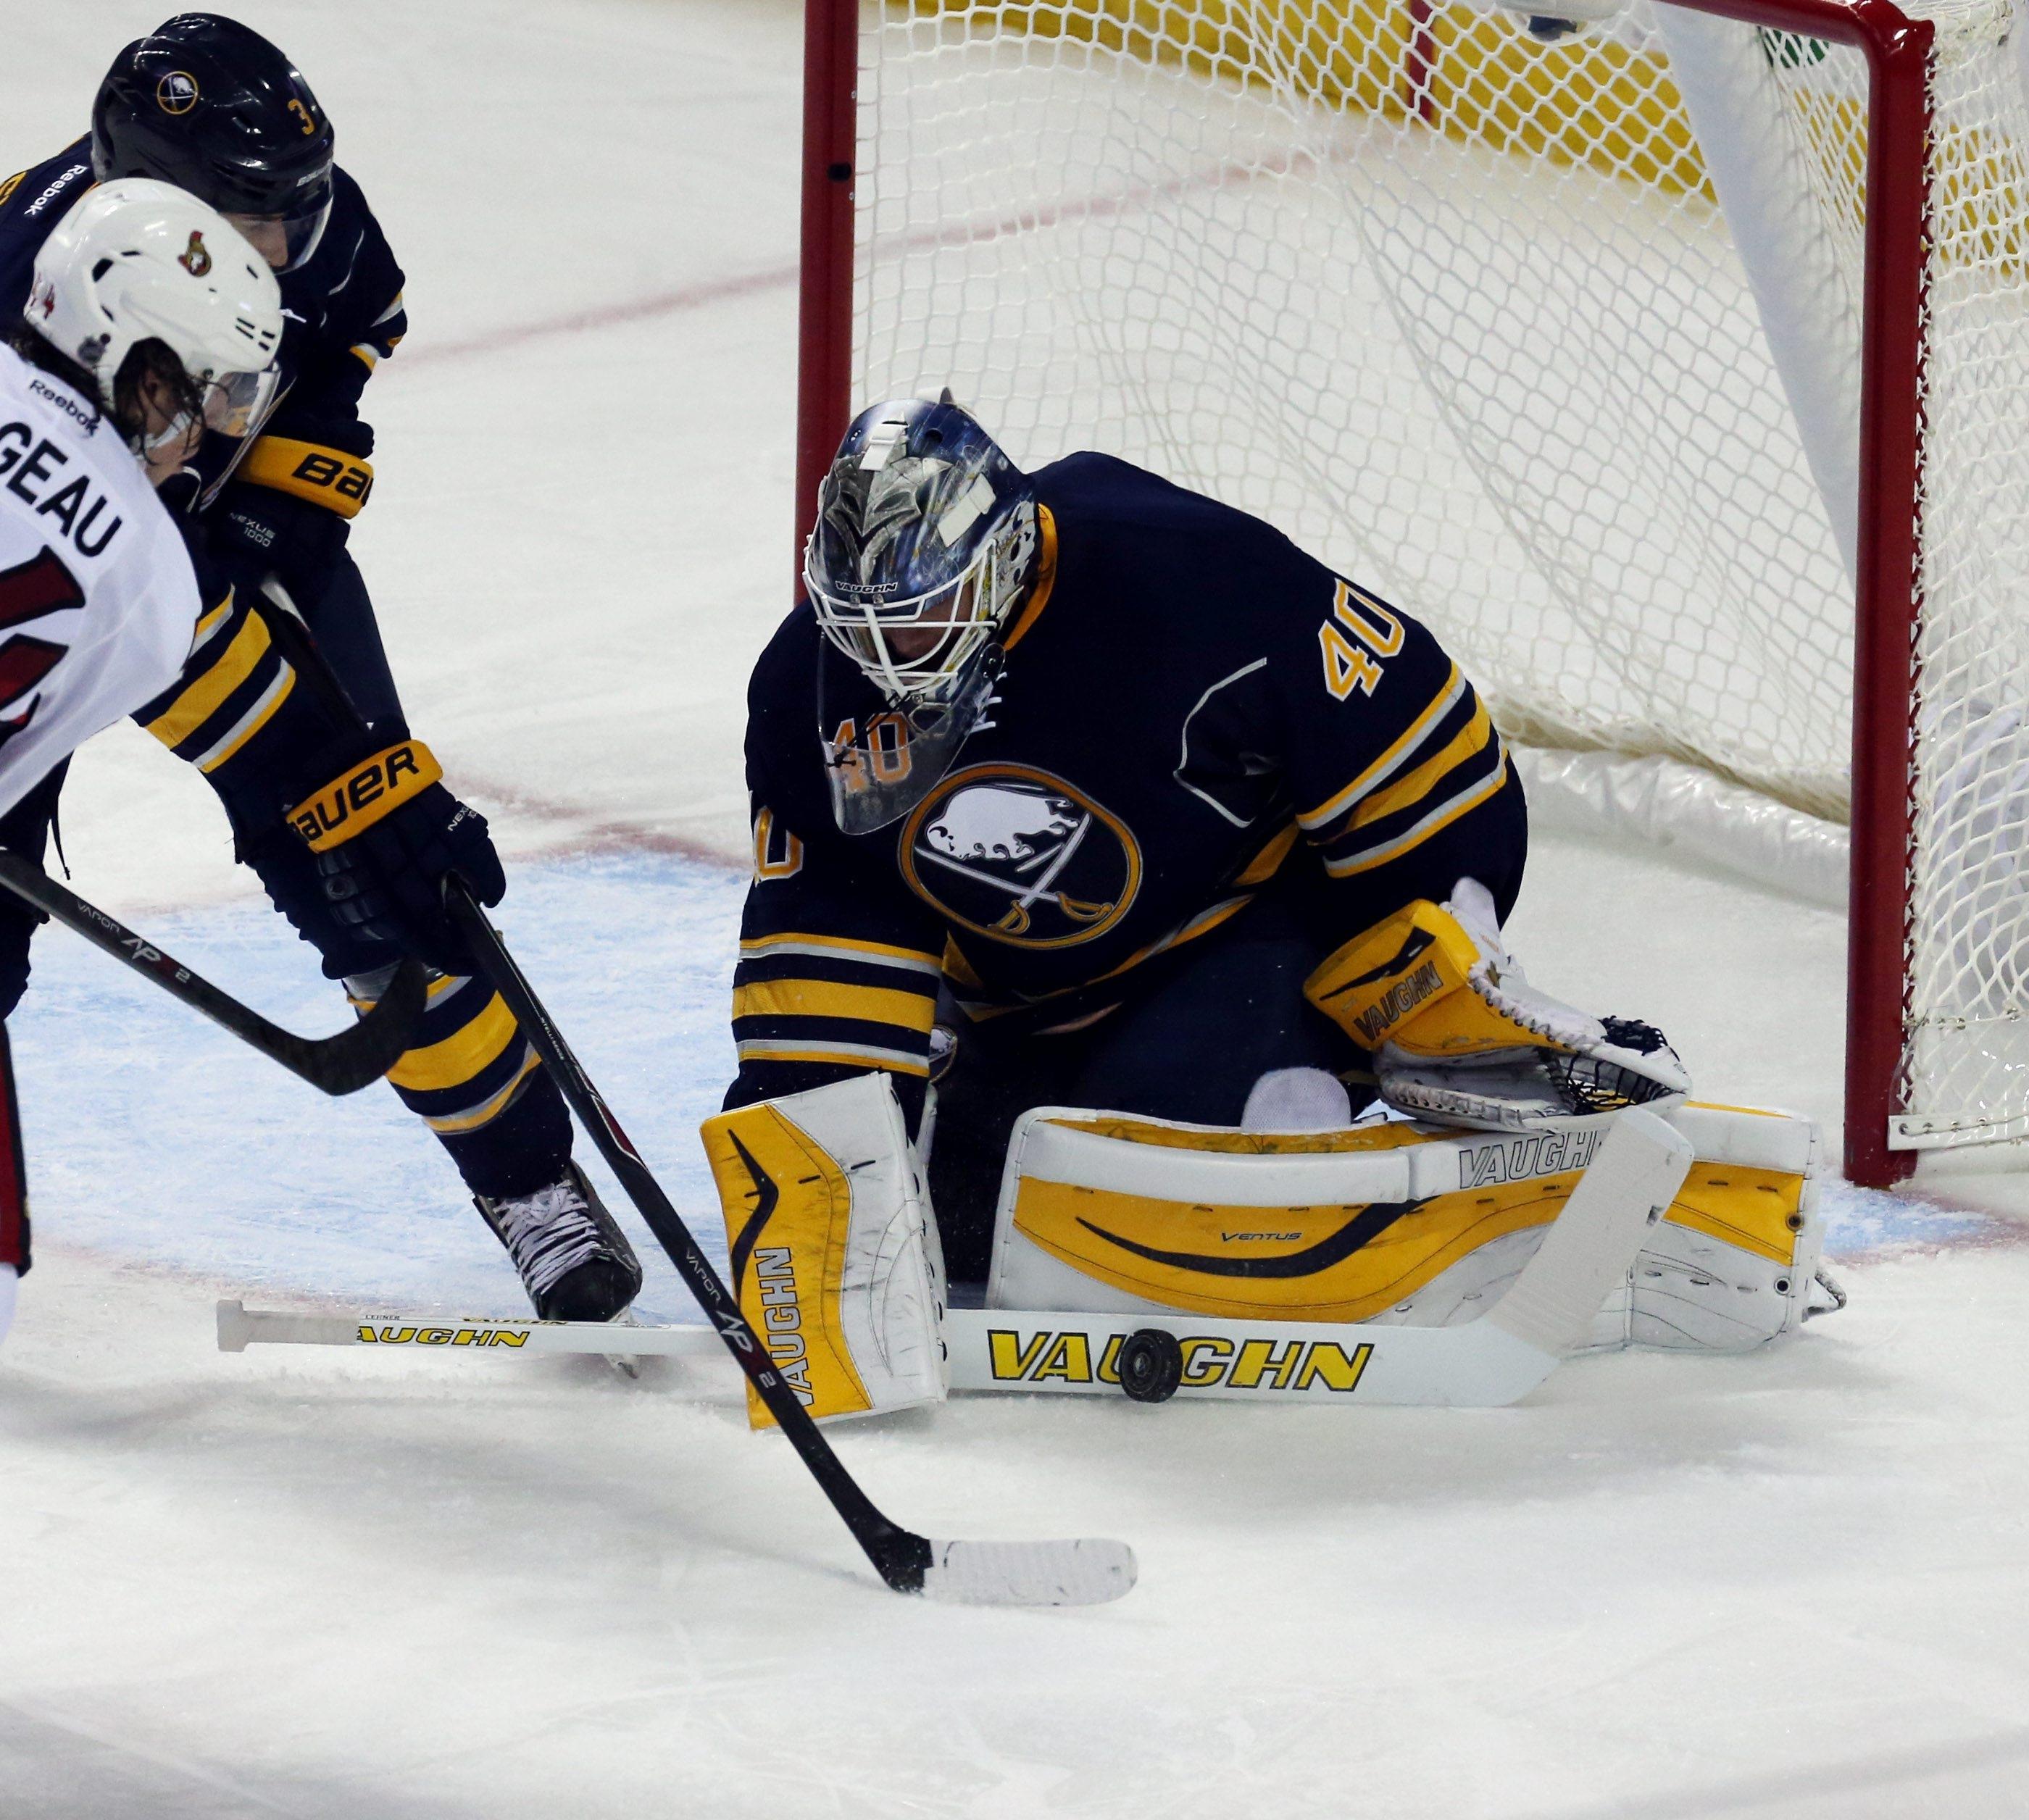 Buffalo Sabres goalie Robin Lehner (40) makes a save in the second period at First Niagara Center in Buffalo,NY on Thursday, Oct. 8, 2015.  (James P. McCoy/ Buffalo News)